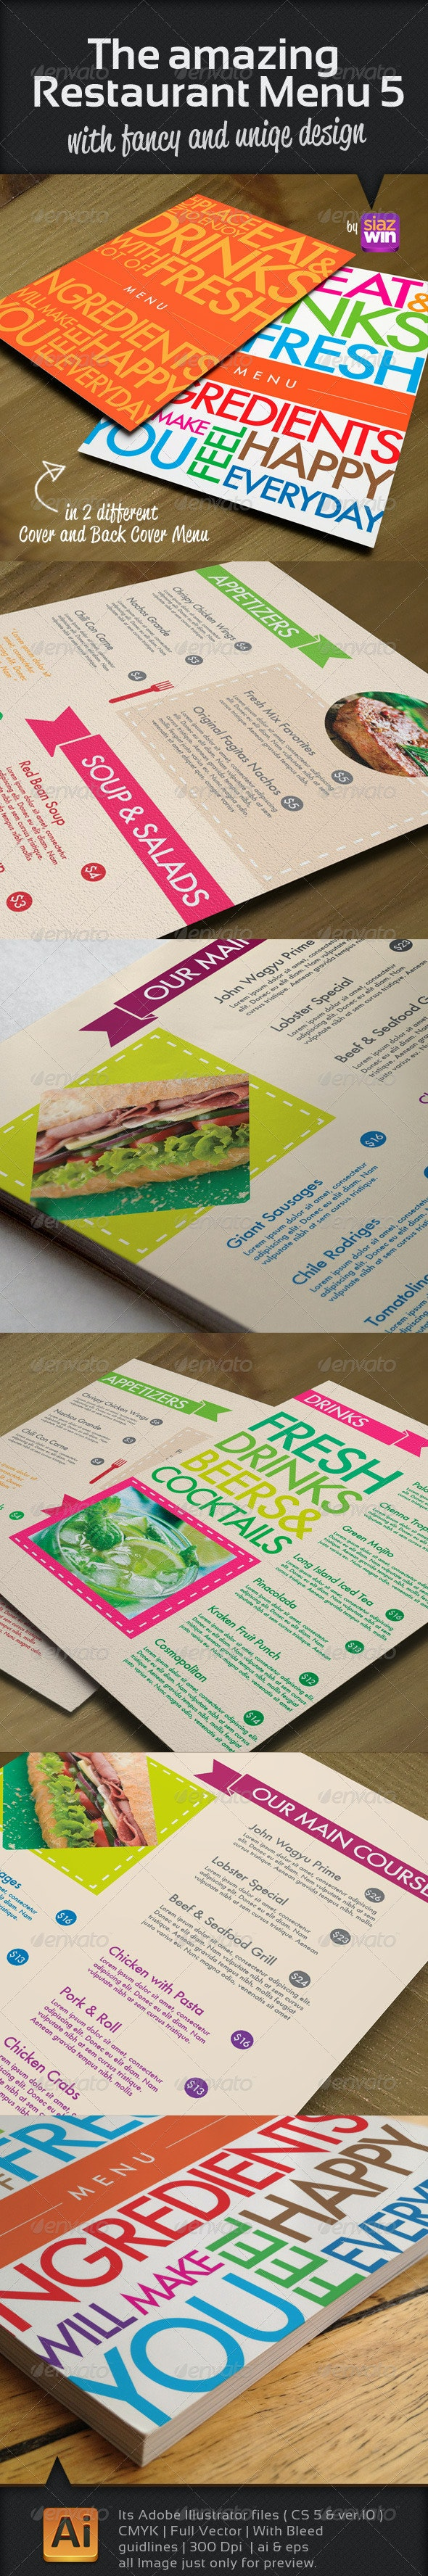 The Restaurant Menu 5 - Food Menus Print Templates